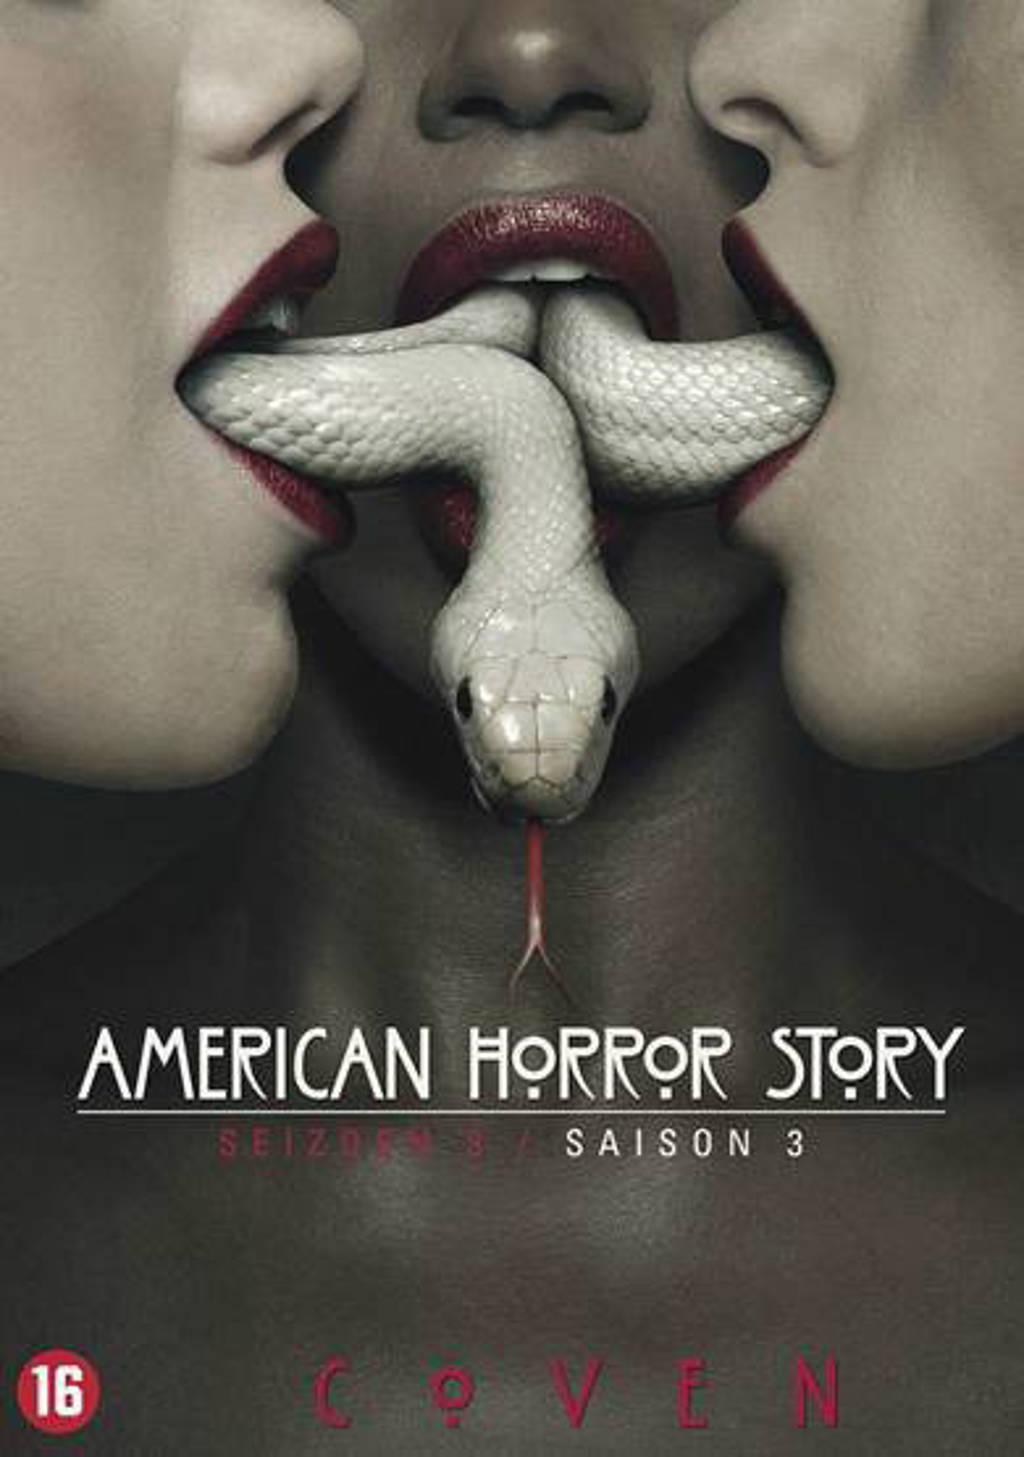 American Horror Story - Seizoen 3 Coven (DVD)